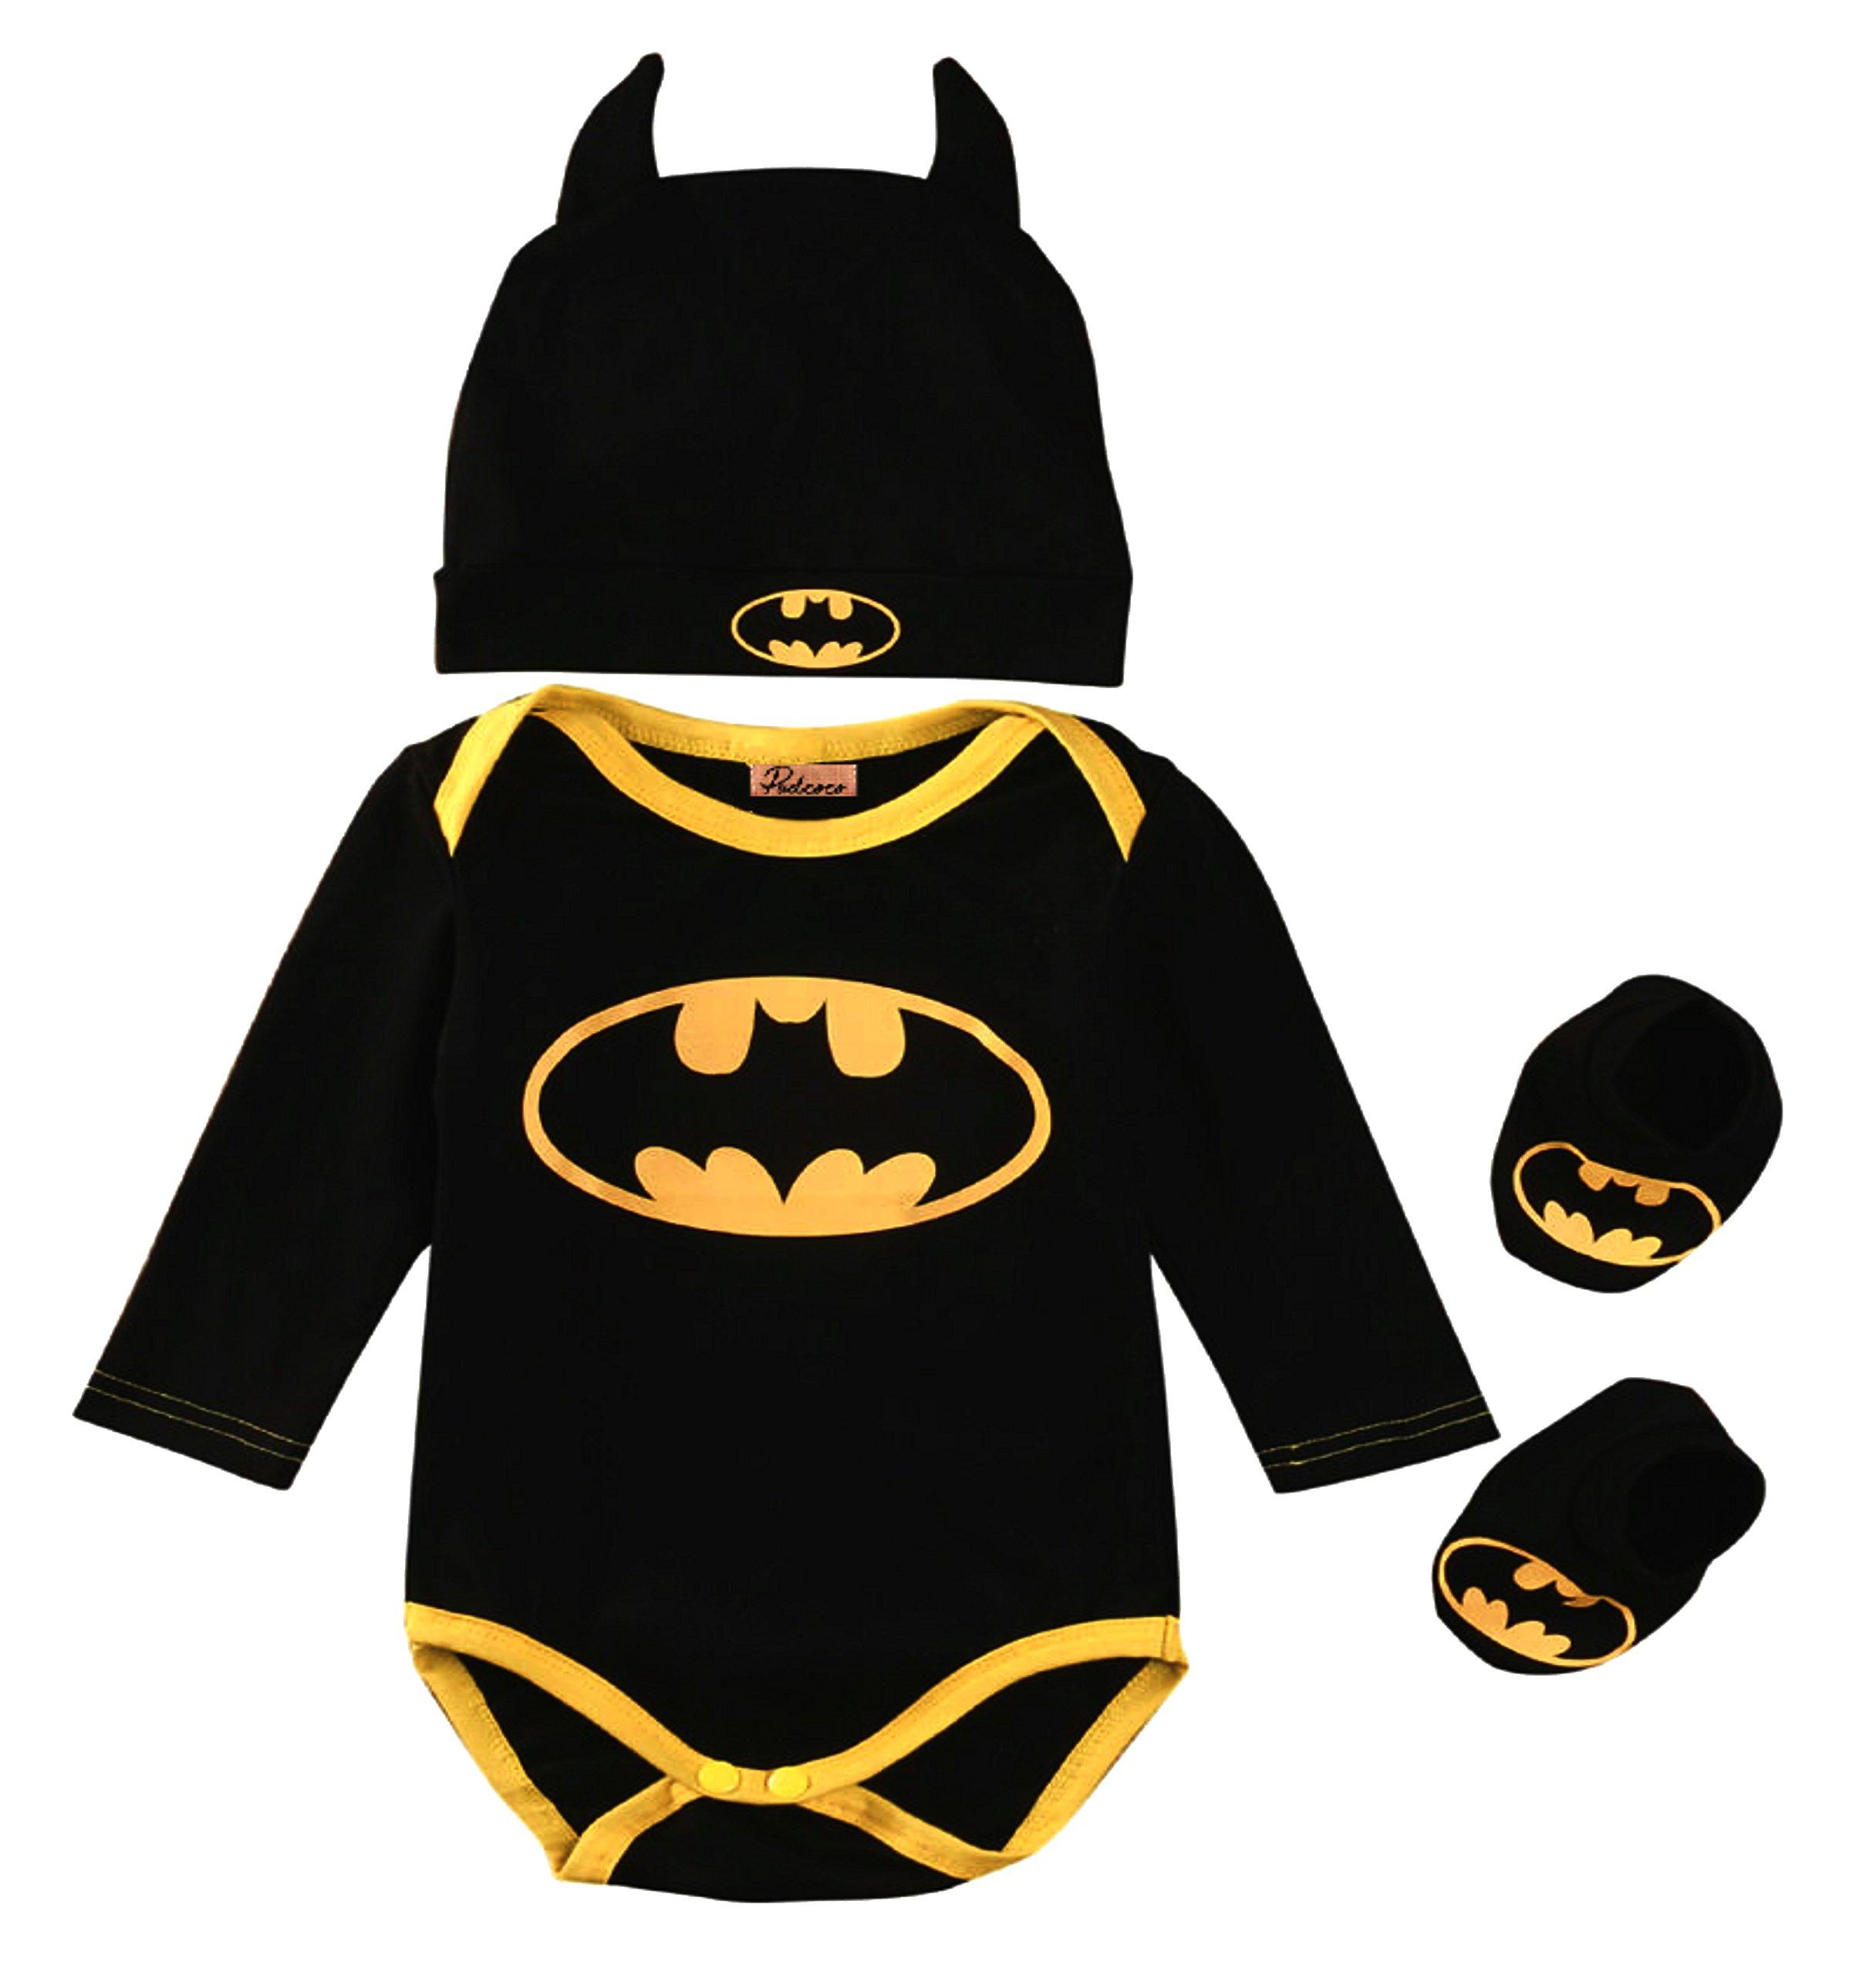 Baby Superhero Onesie: 3 Piece Outfits Set (0-6 Months, Batman Long Sleeves)